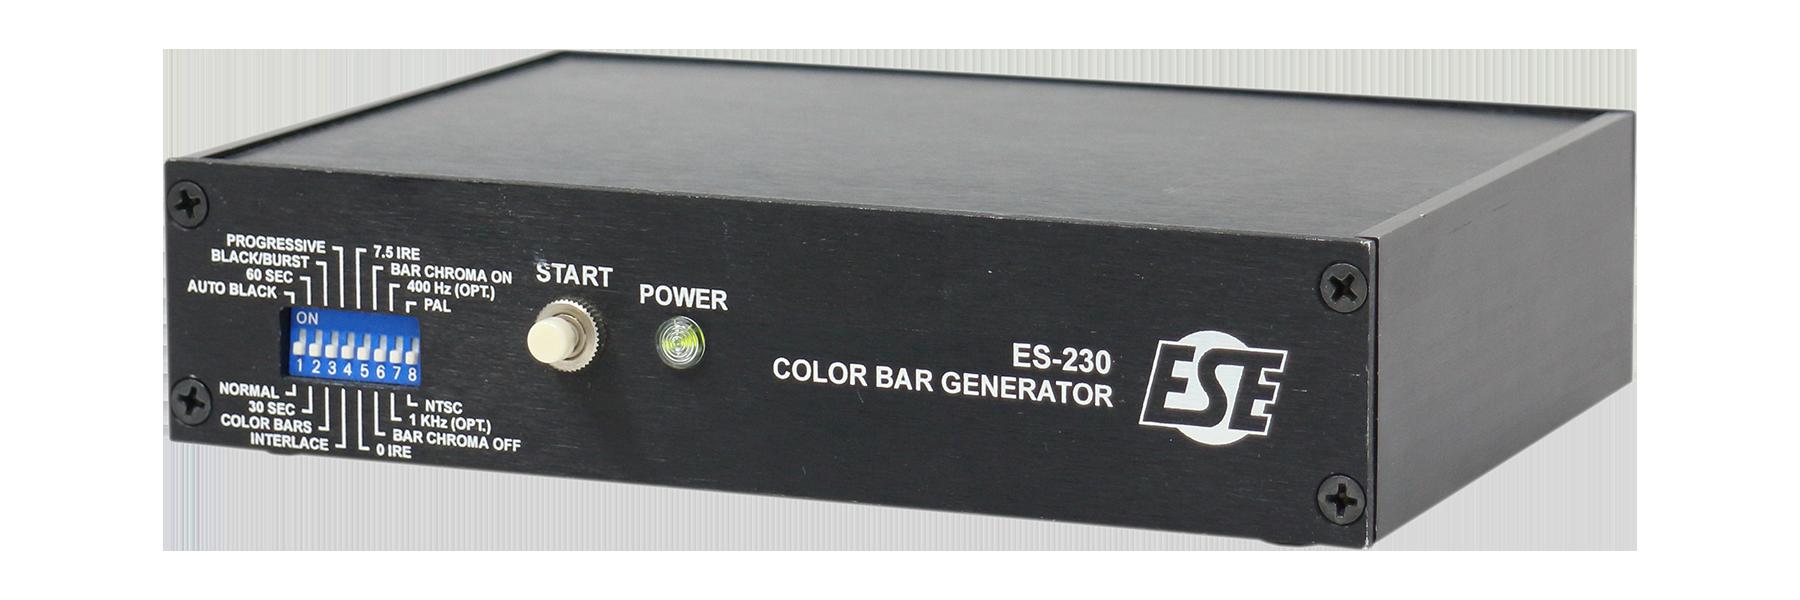 ES-230